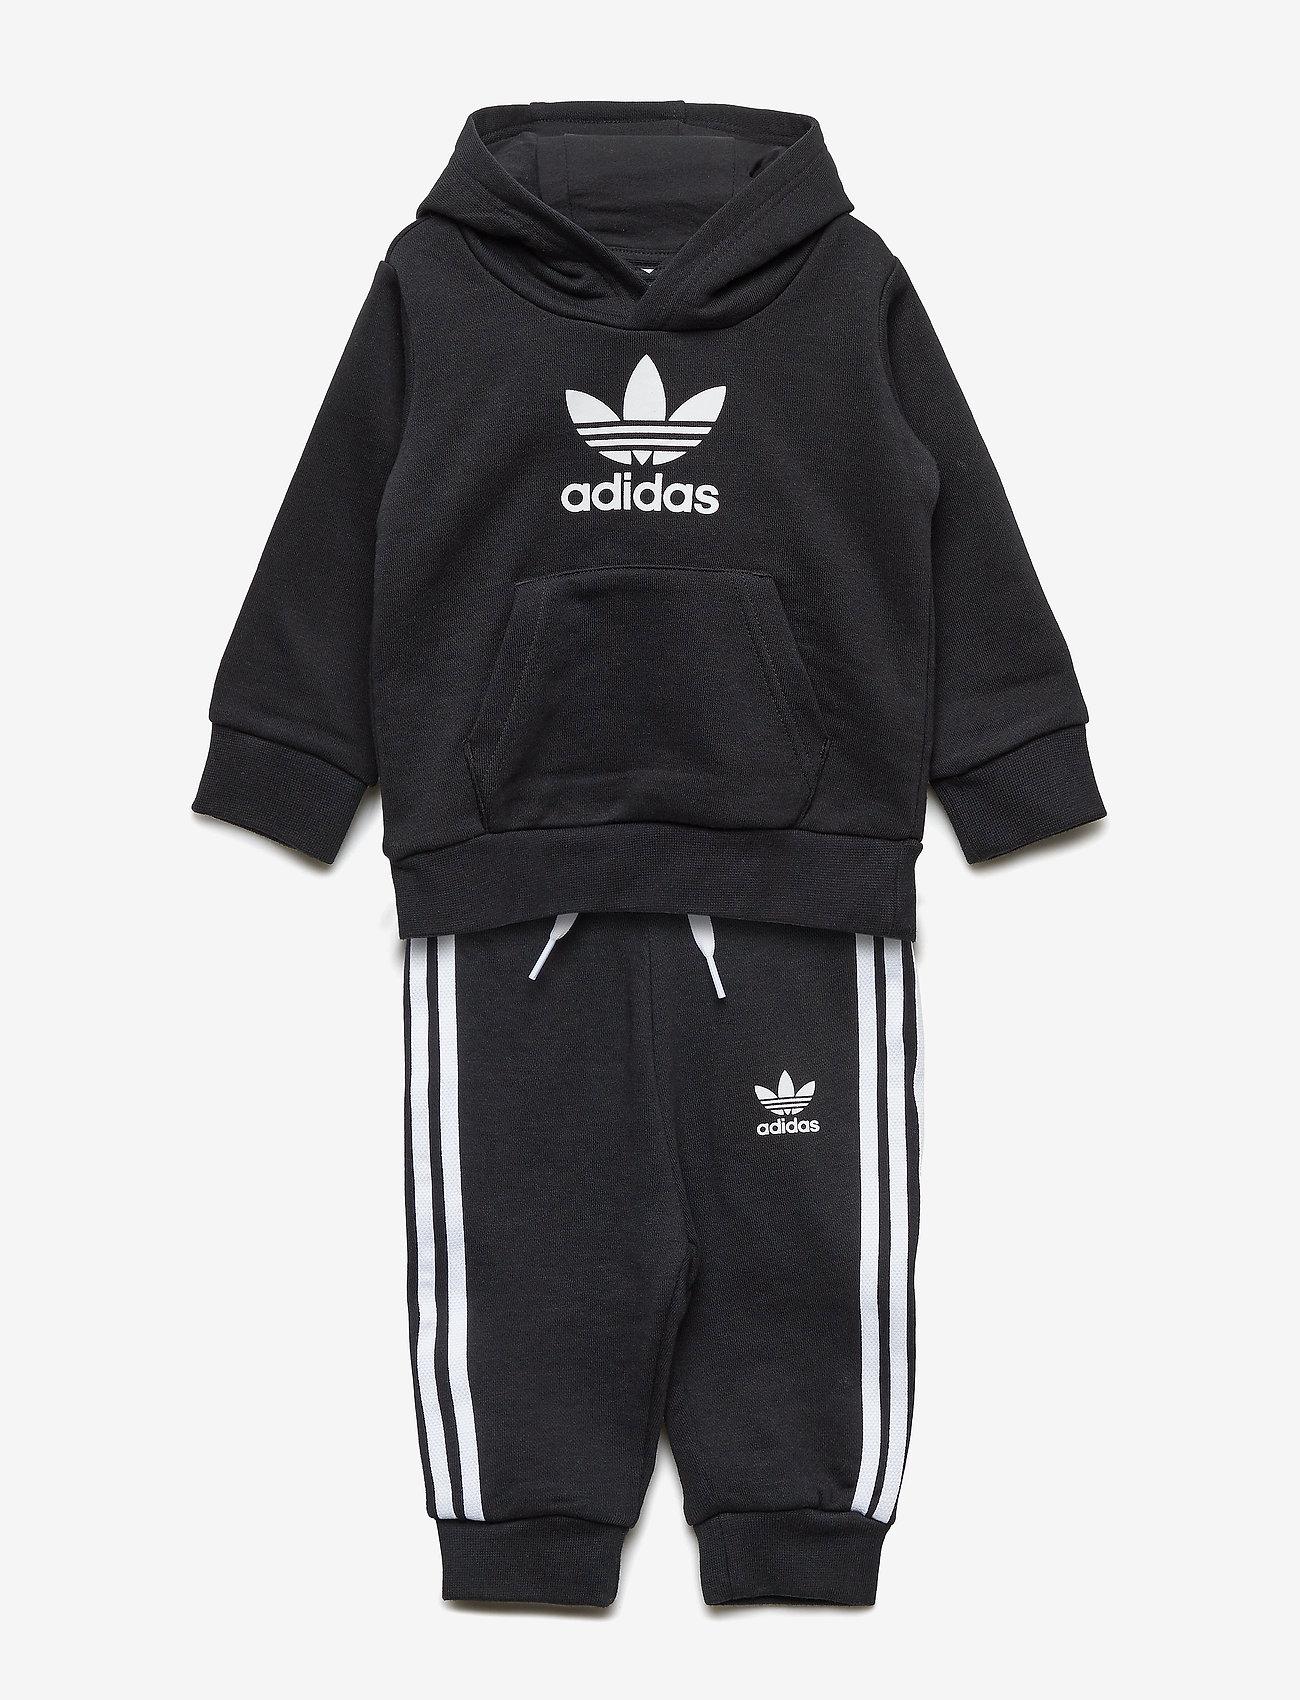 adidas Originals - TREFOIL HOODIE - trainingsanzug - black/white - 0